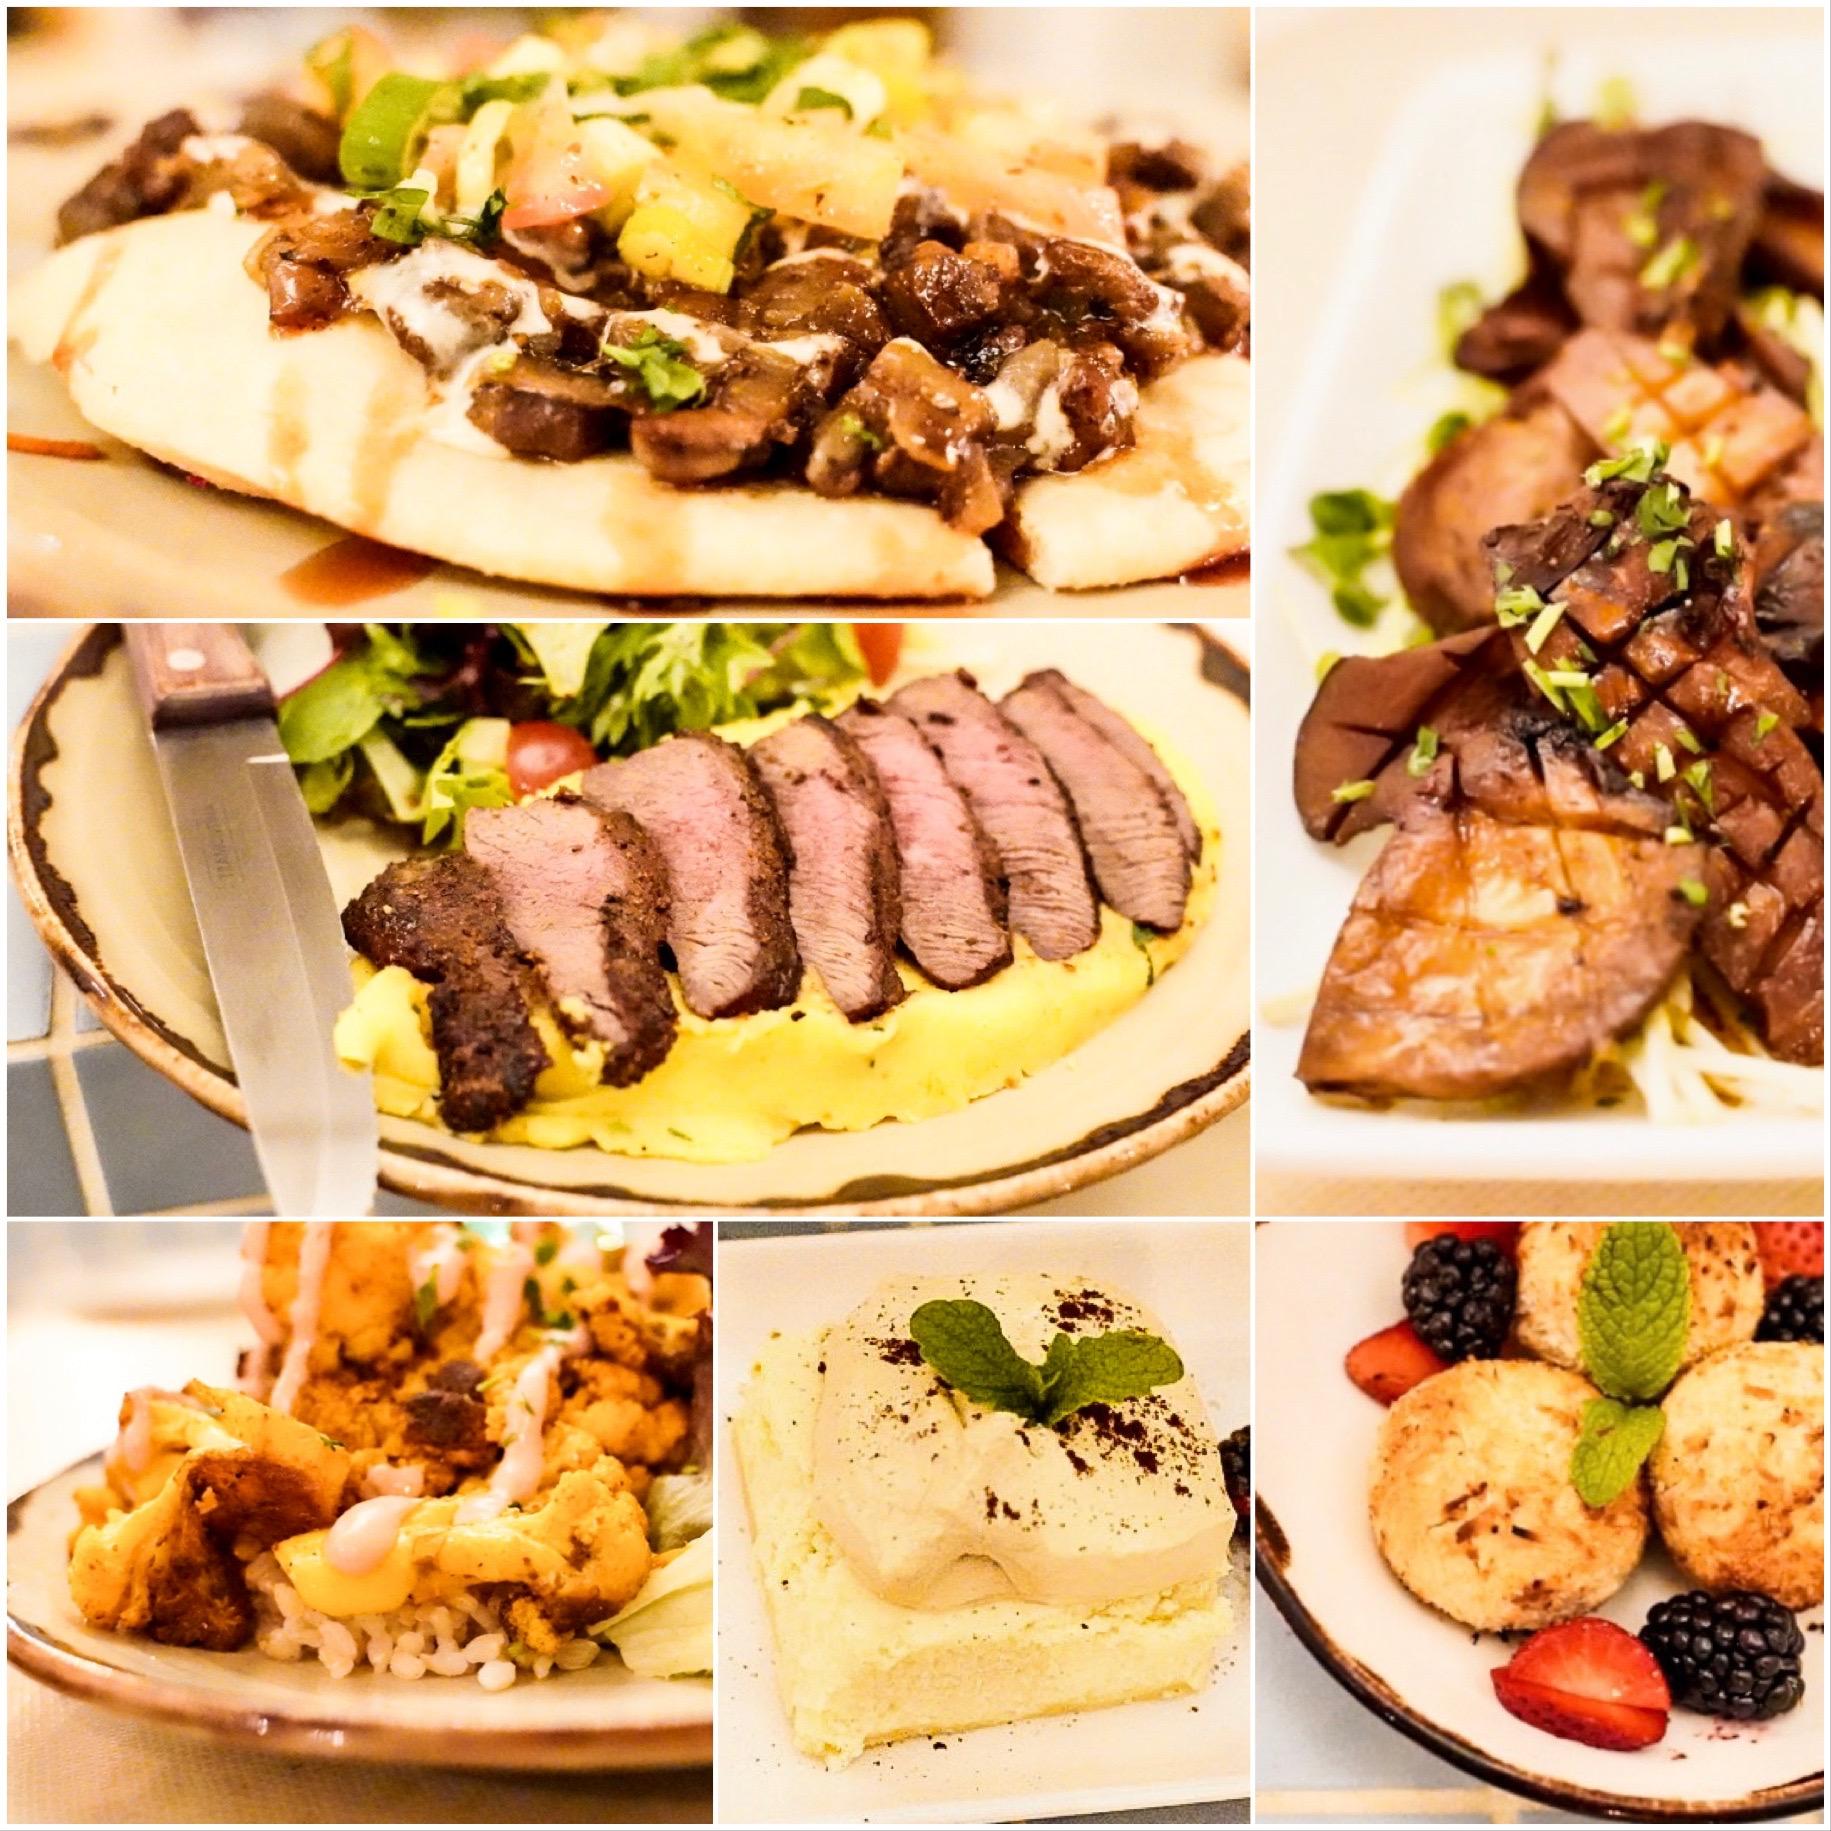 From the top-left clockwise:Lahmajeen Man'oushe,King Oyster Mushroom Mezze,Chocolate Ma'amoul,Turkish Coffee Cheesecake, Cauliflower Arnabiyeh, andGrilled Bison Flat Iron